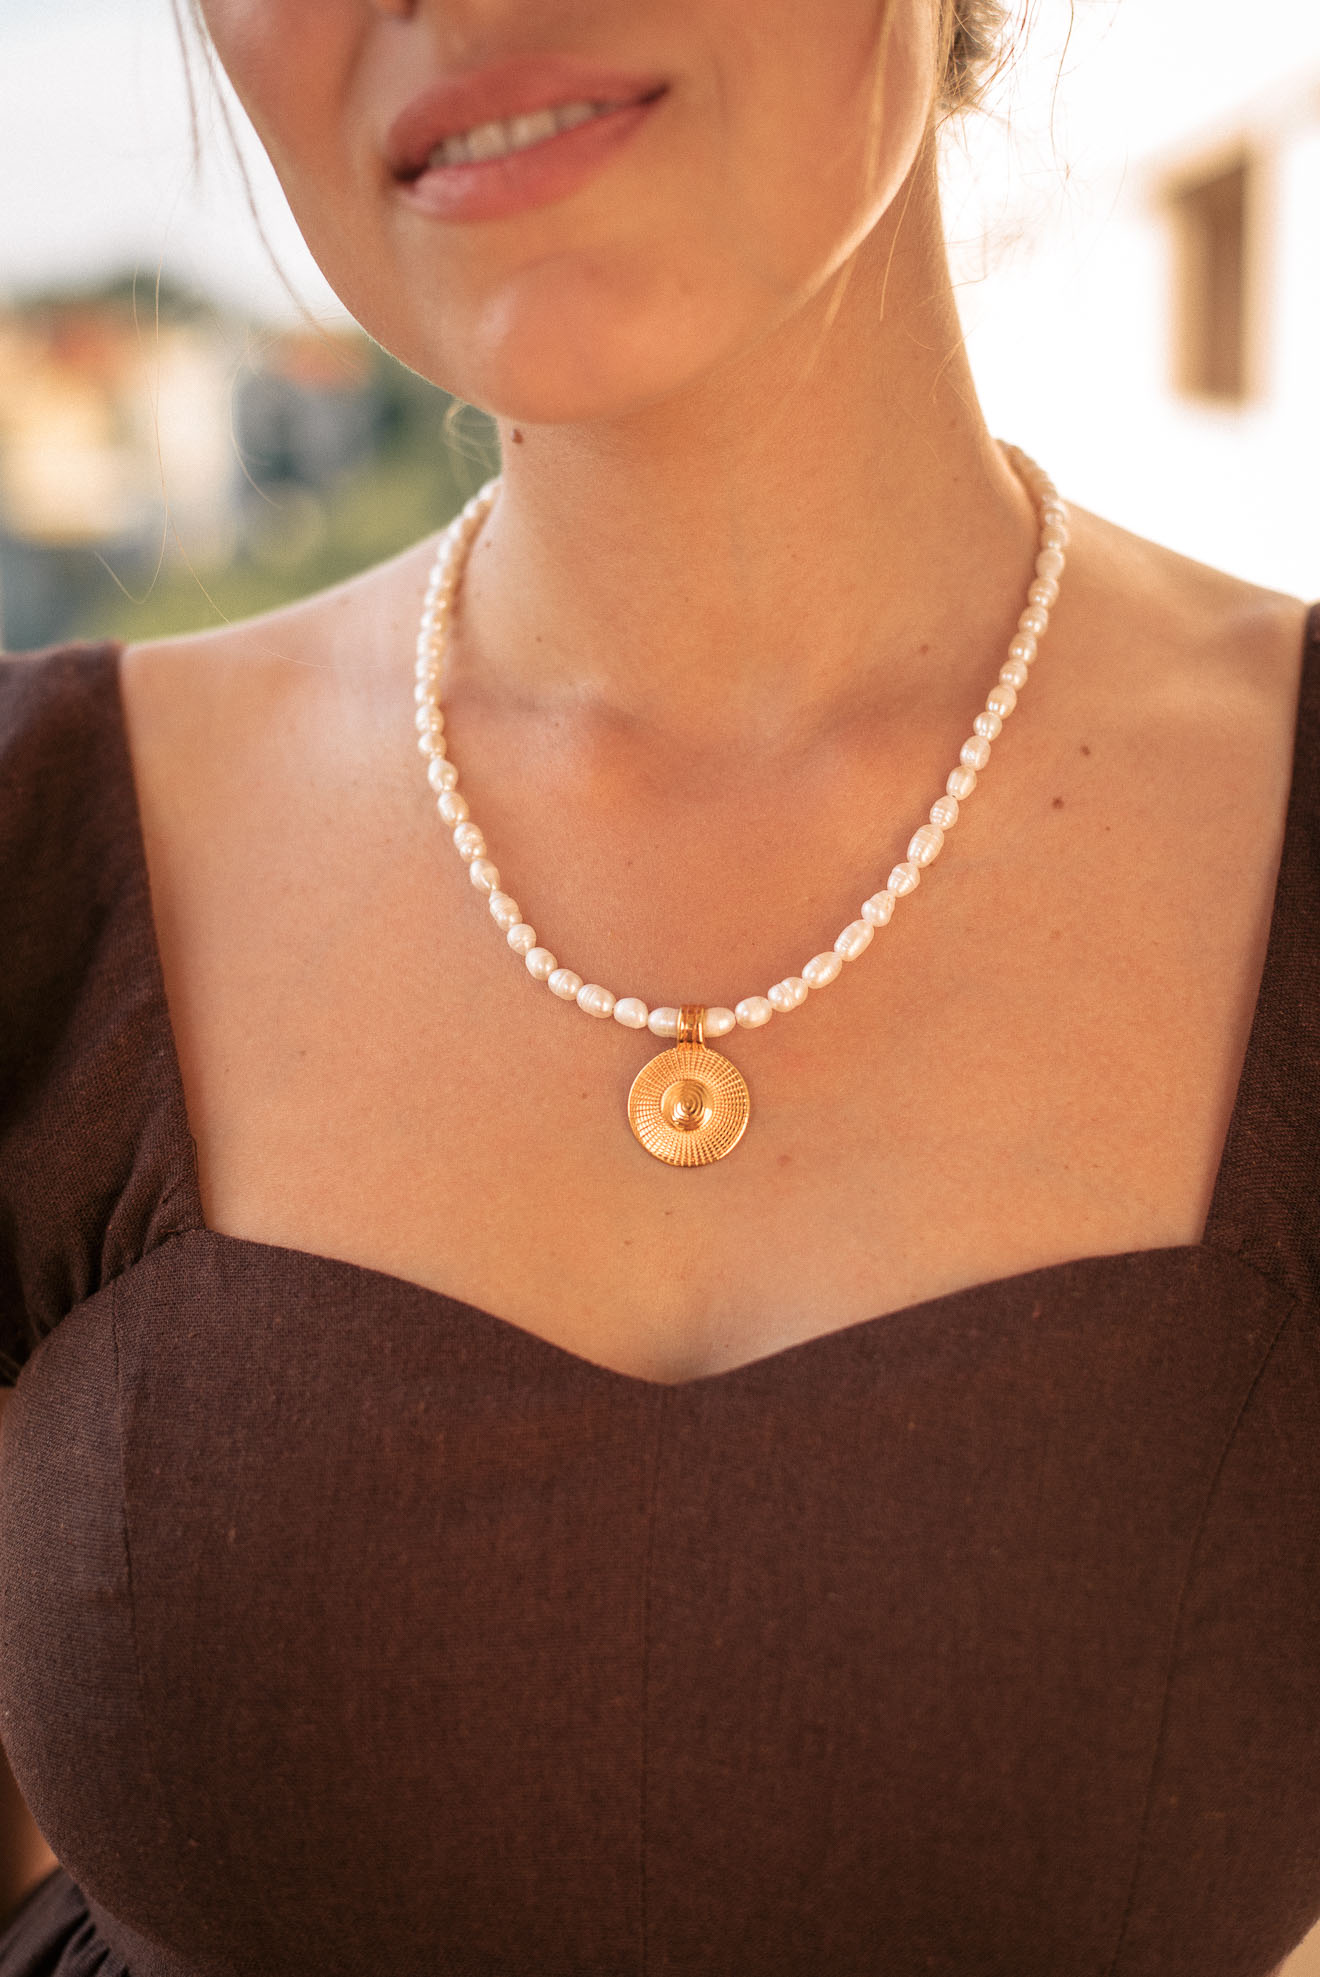 Necklace pendant by Denina Martin